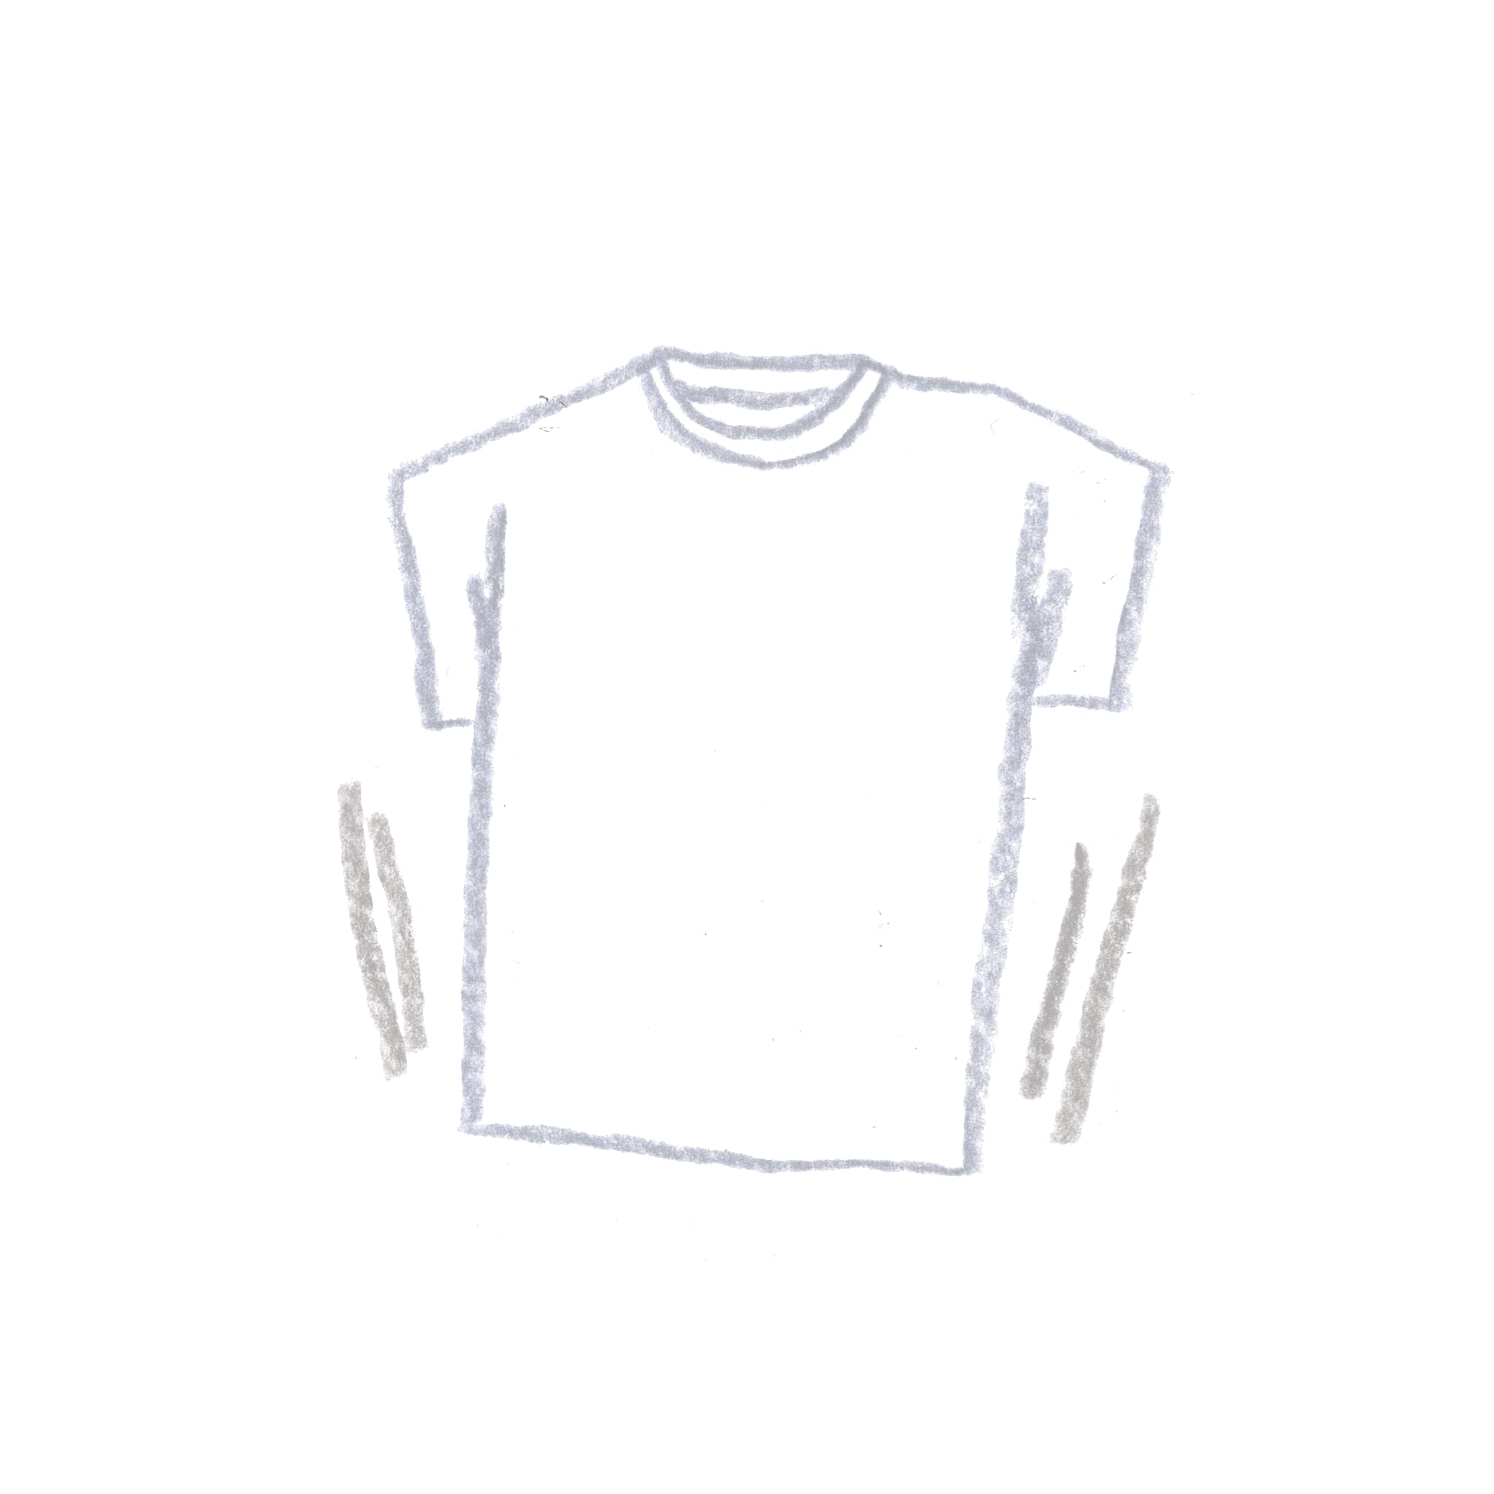 C:繊維修復機能